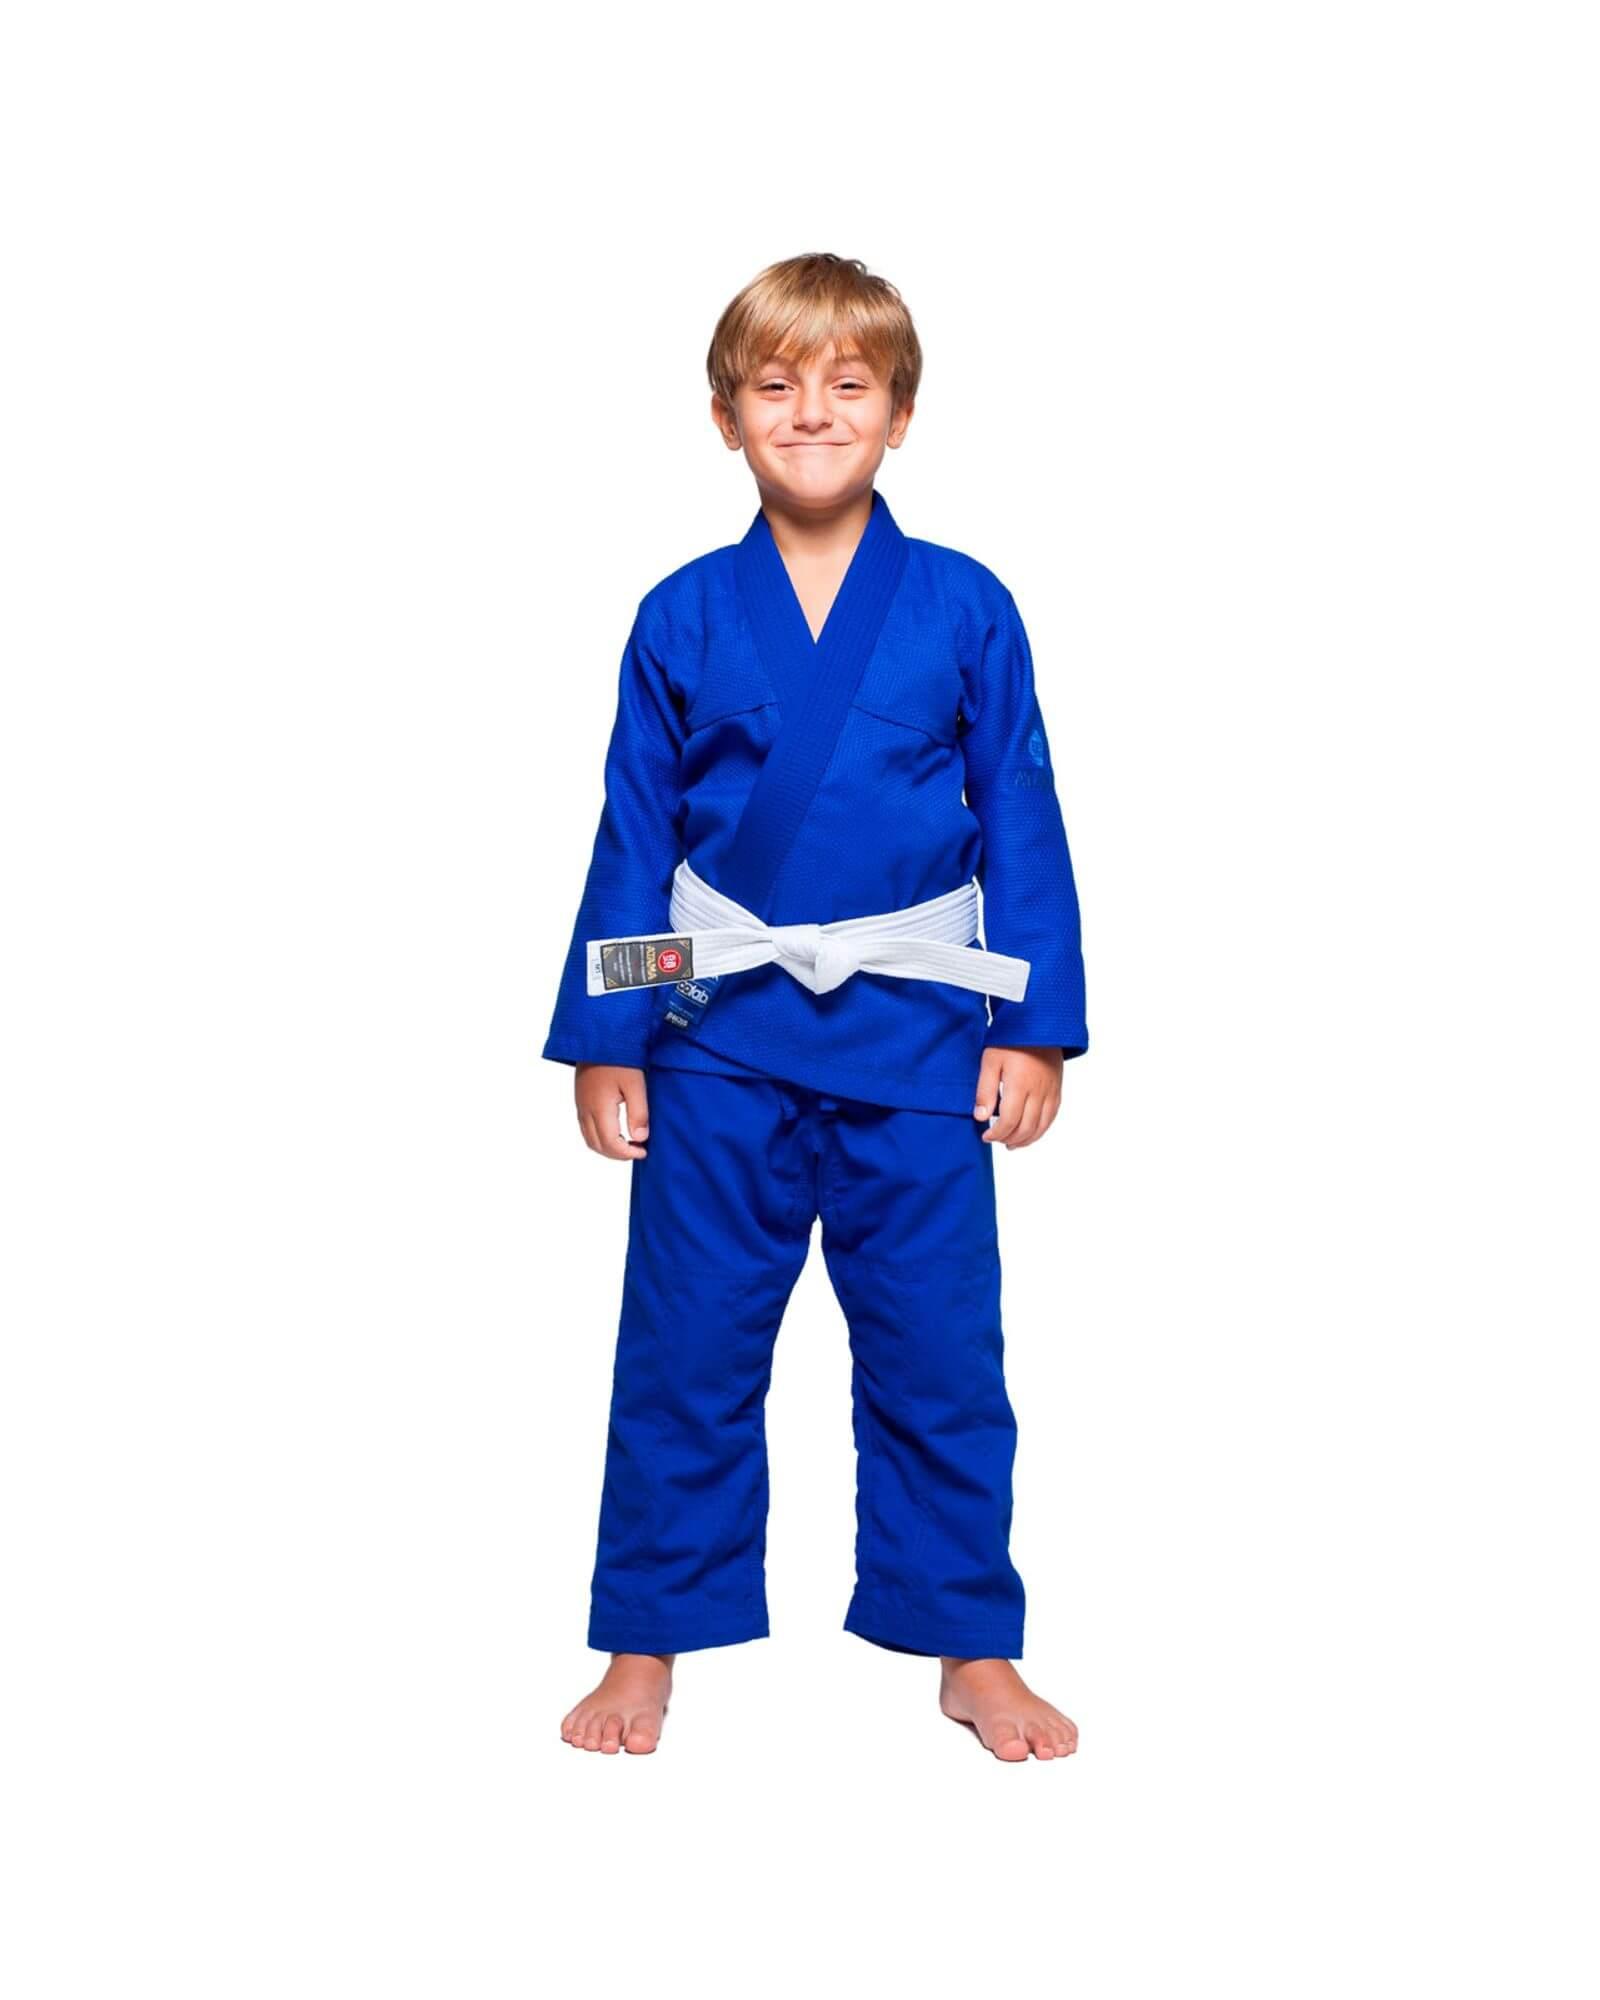 Kimono Jiu Jitsu Atama Infinity Collab Infantil Azul - Unissex